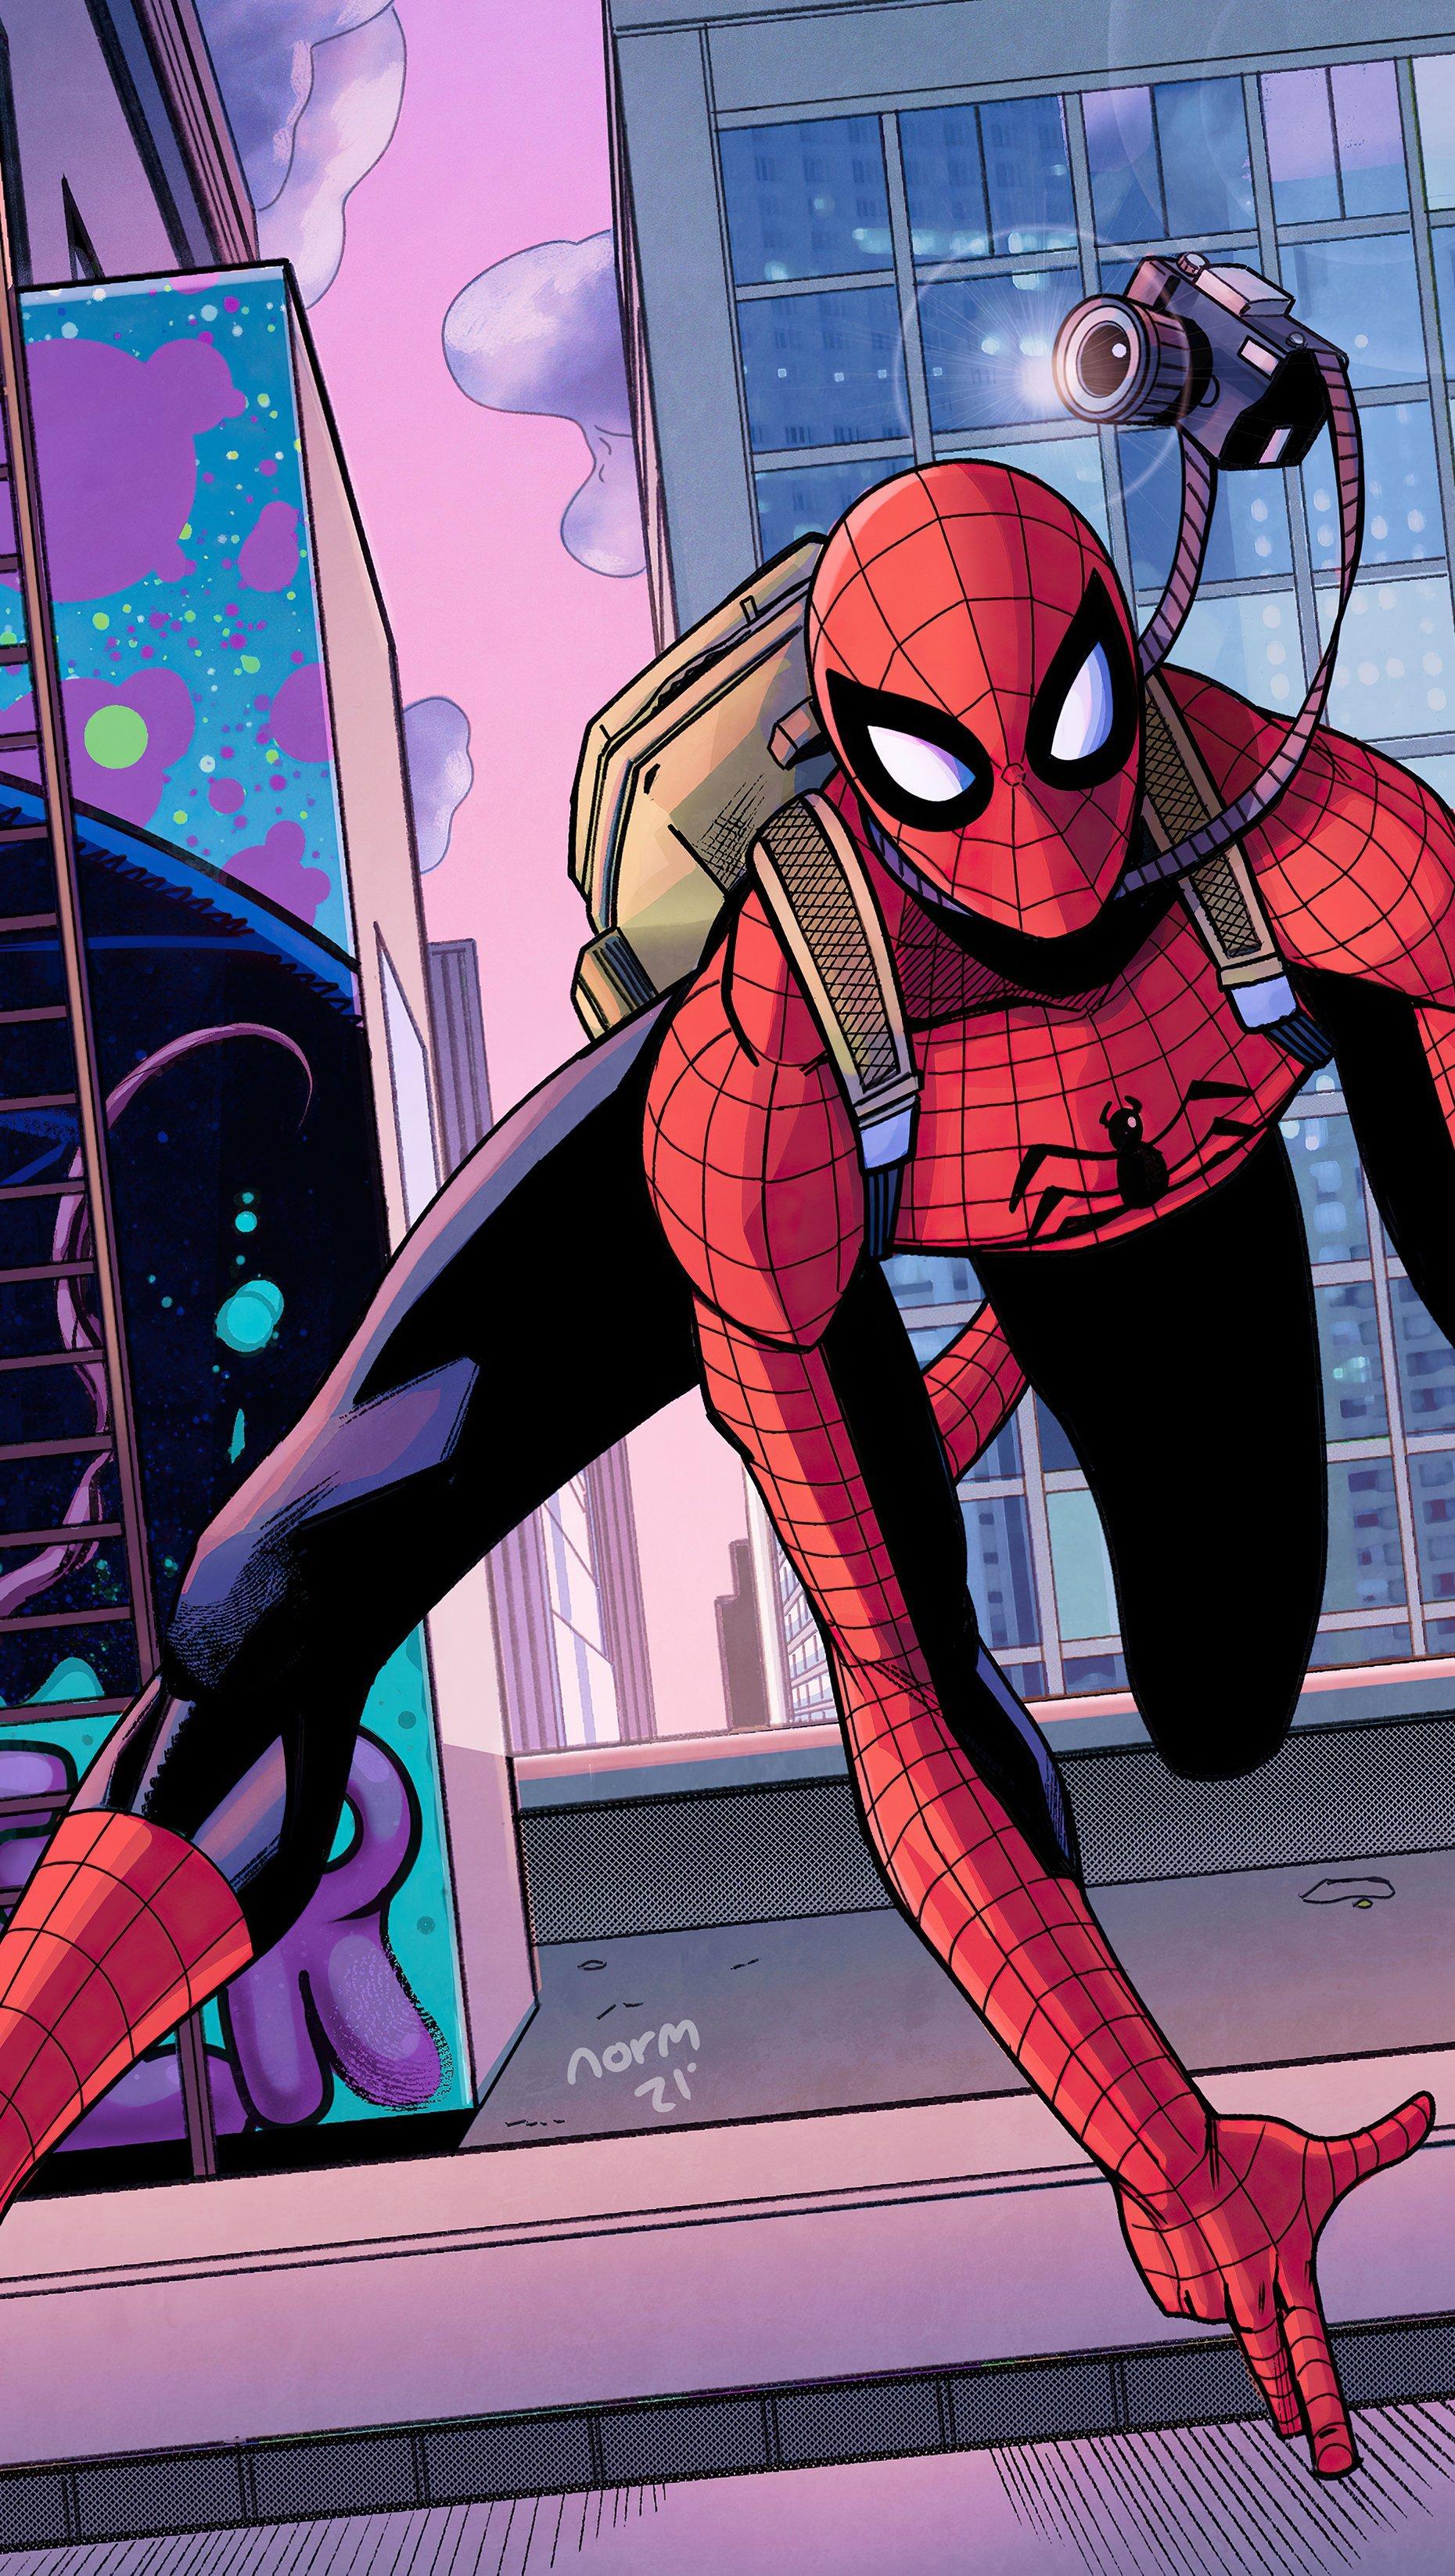 Wallpaper Spider Man taking pictures Vertical